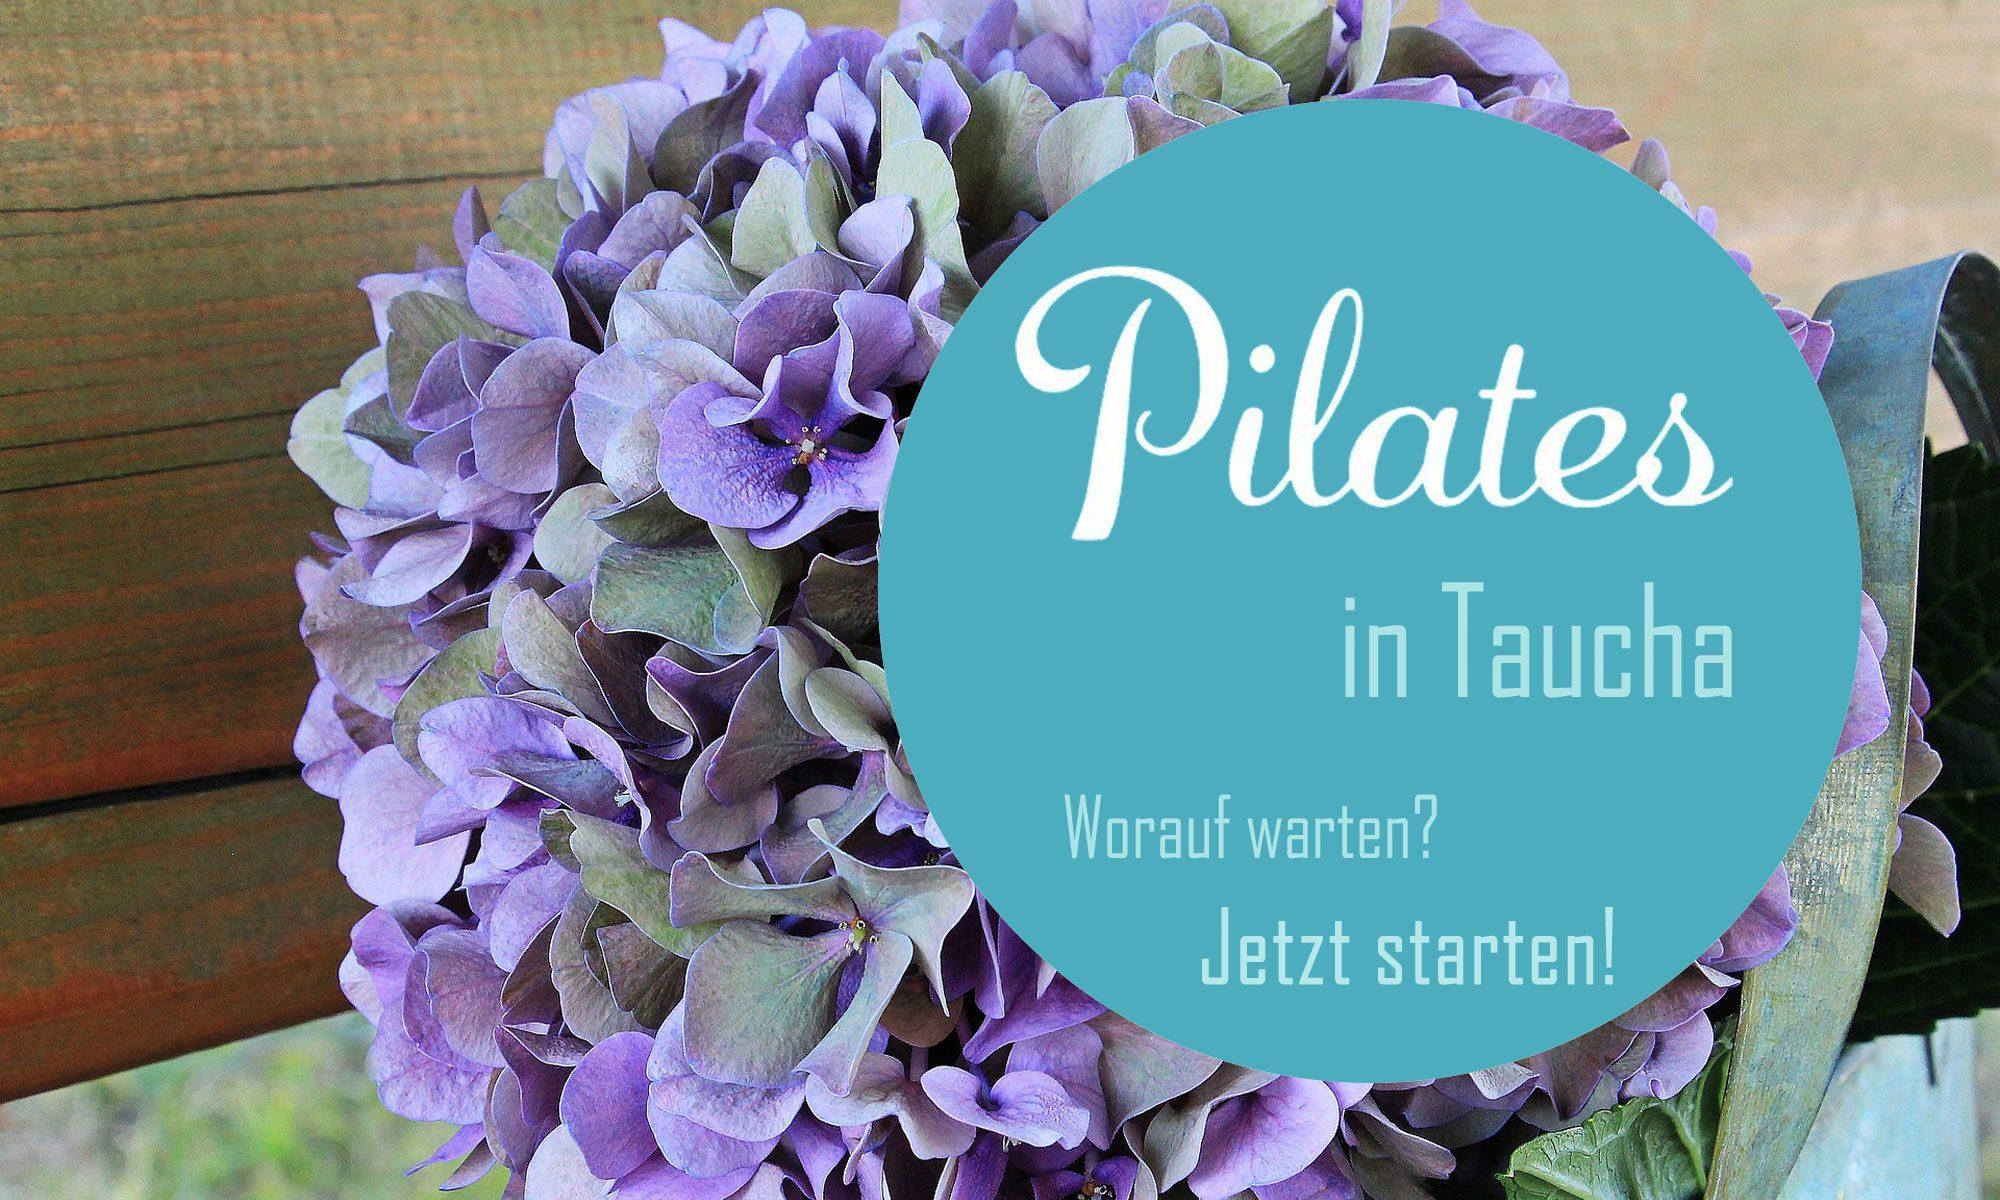 Pilates in Taucha